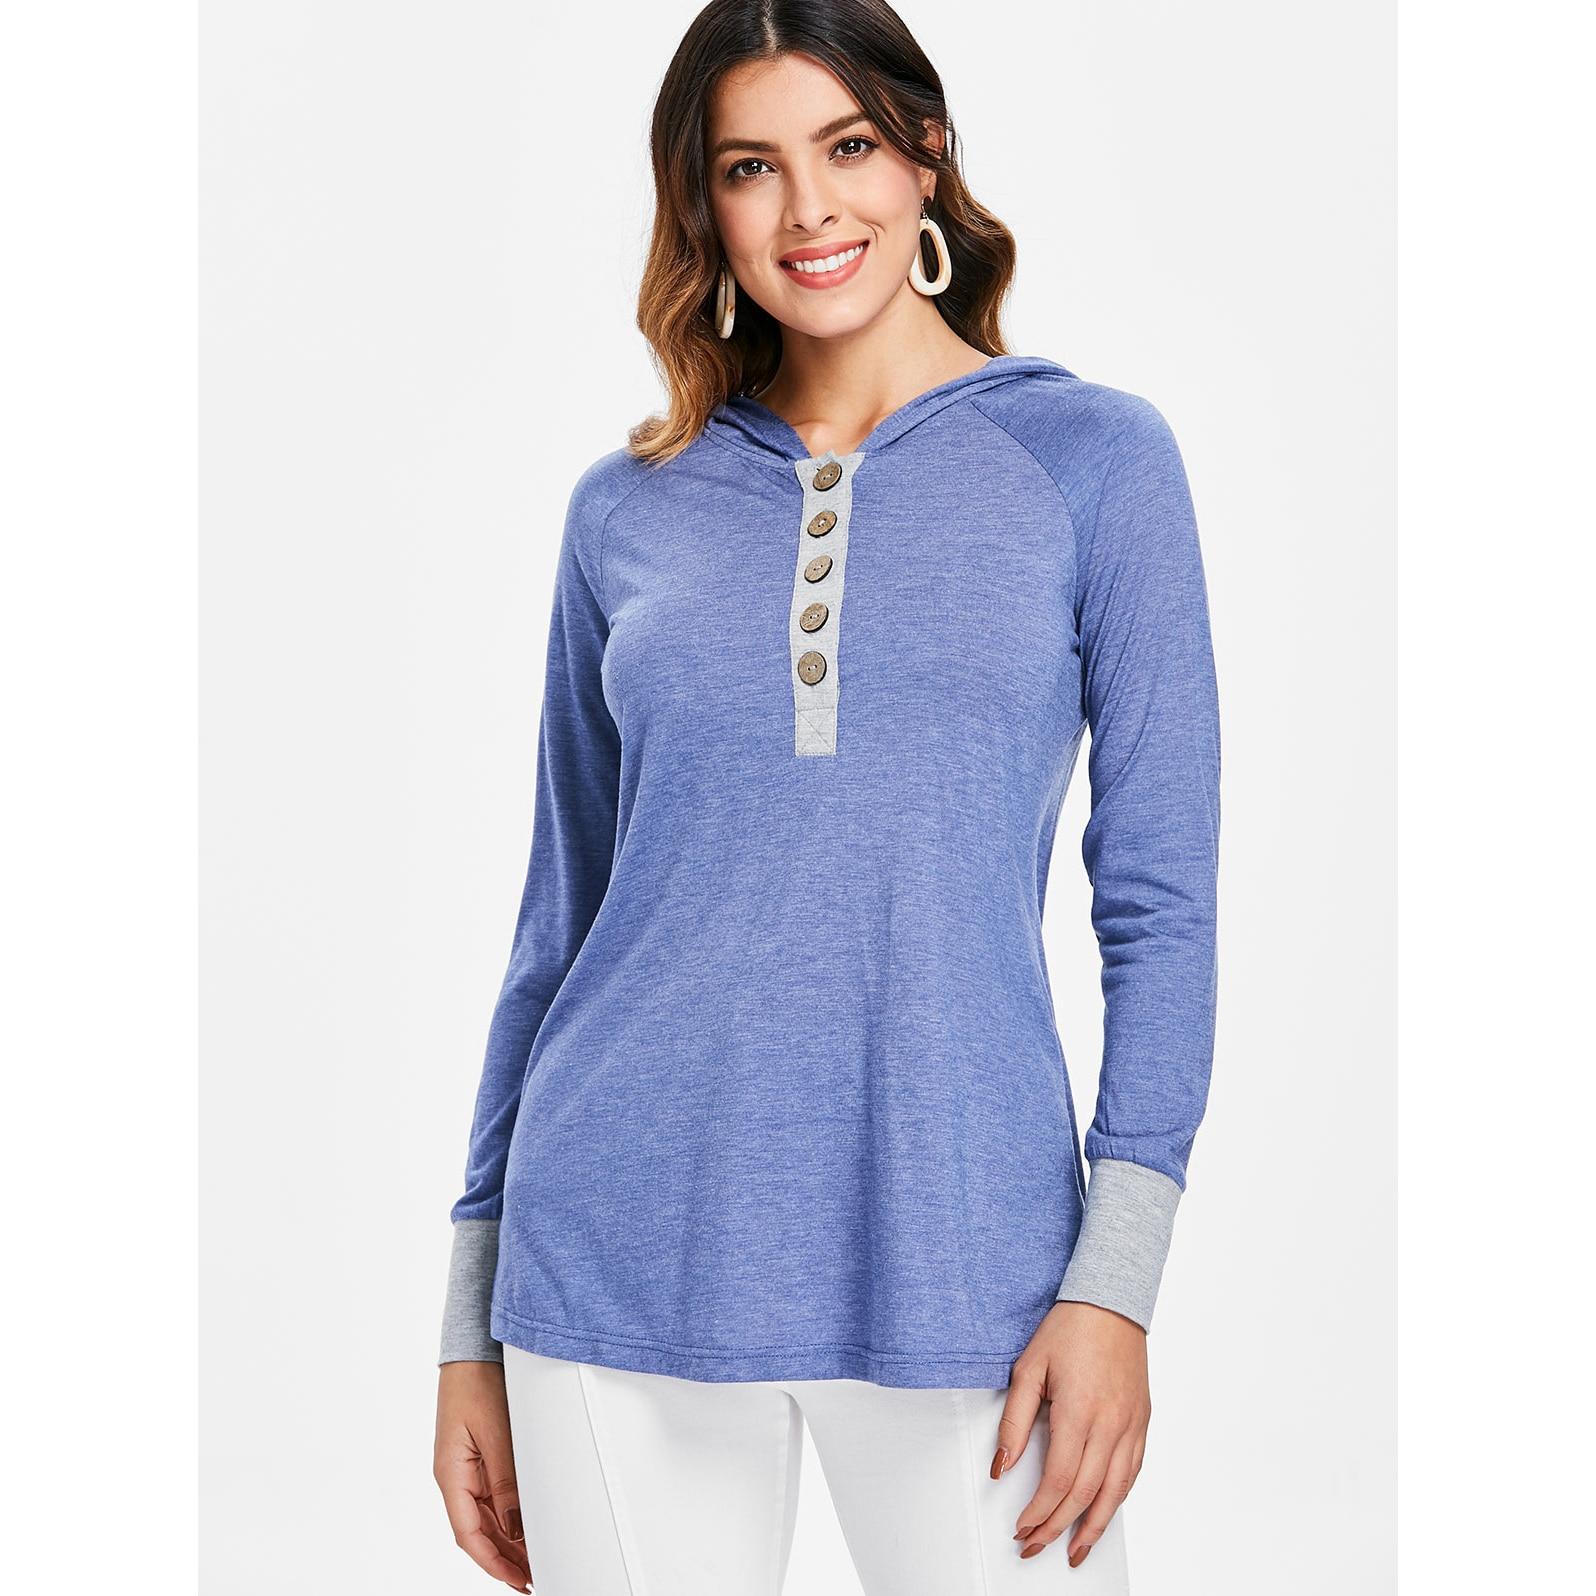 Camisas Camisa Casual Contraste Steel De Mujer Las Con Manga Larga Light Tops Mujeres Kenancy Otoño Capucha Damas Raglán Blue Blusas AxP7n7q